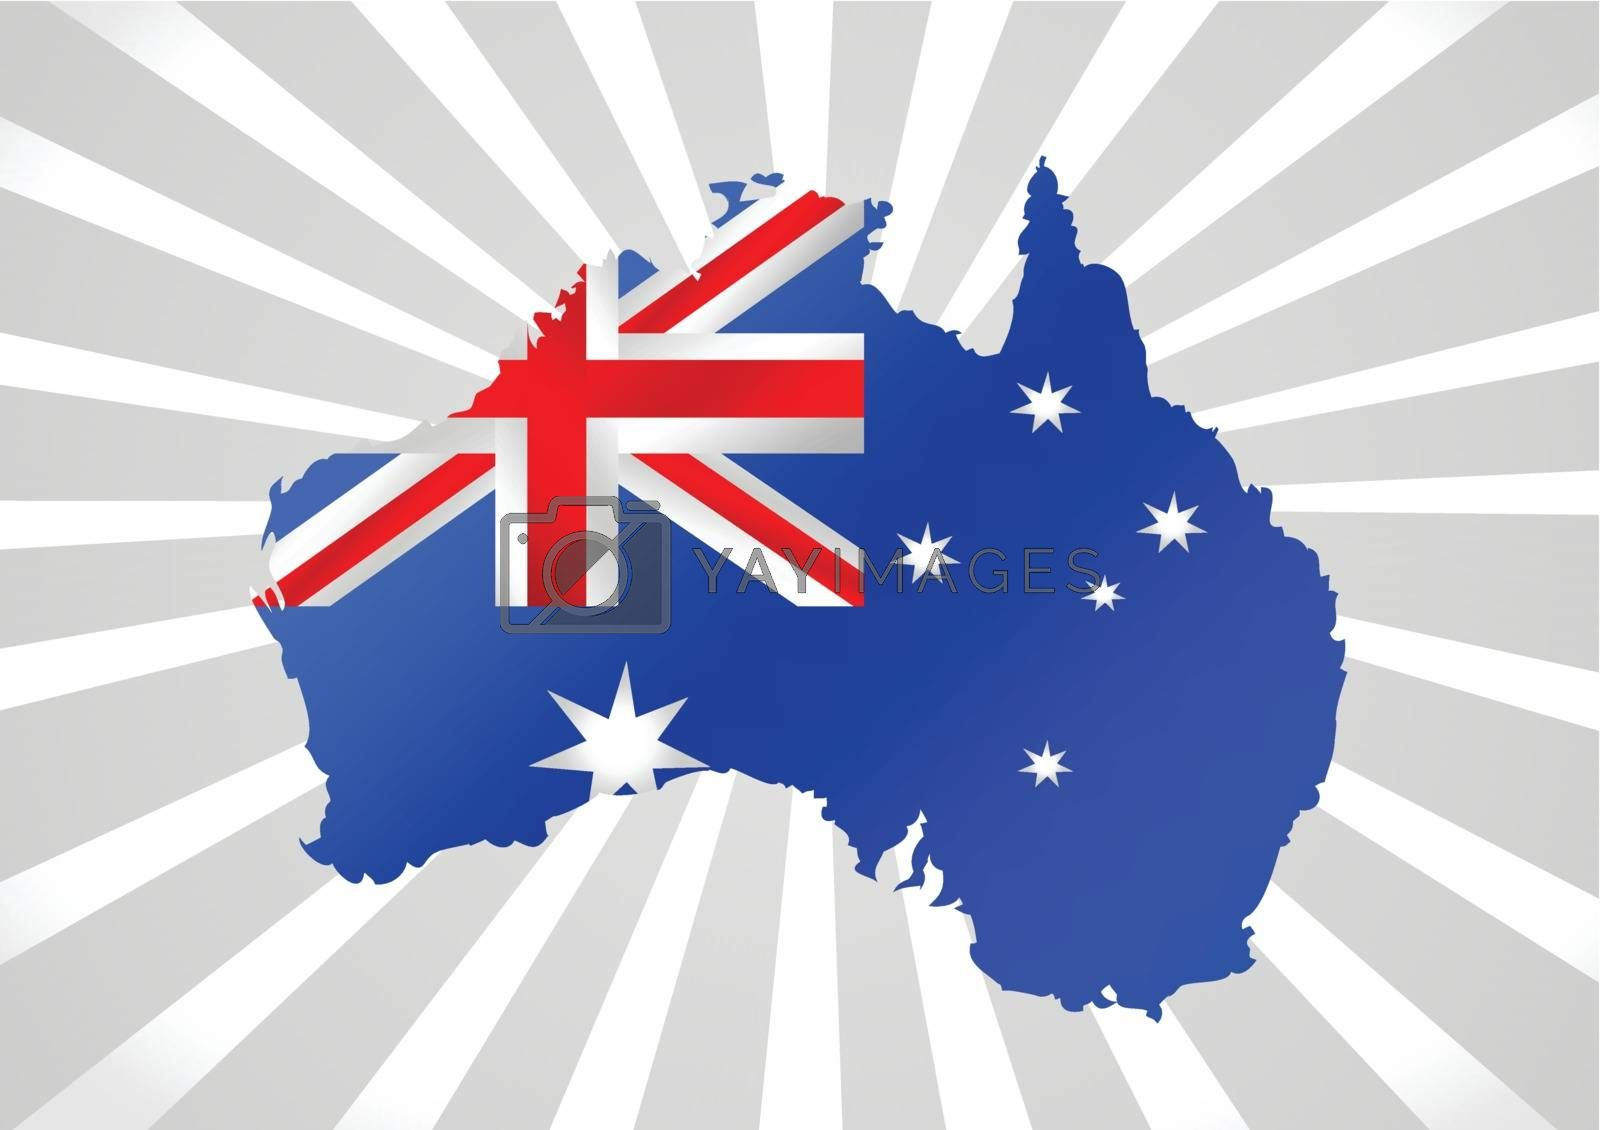 Map and flag of Australia idea design by kiddaikiddee